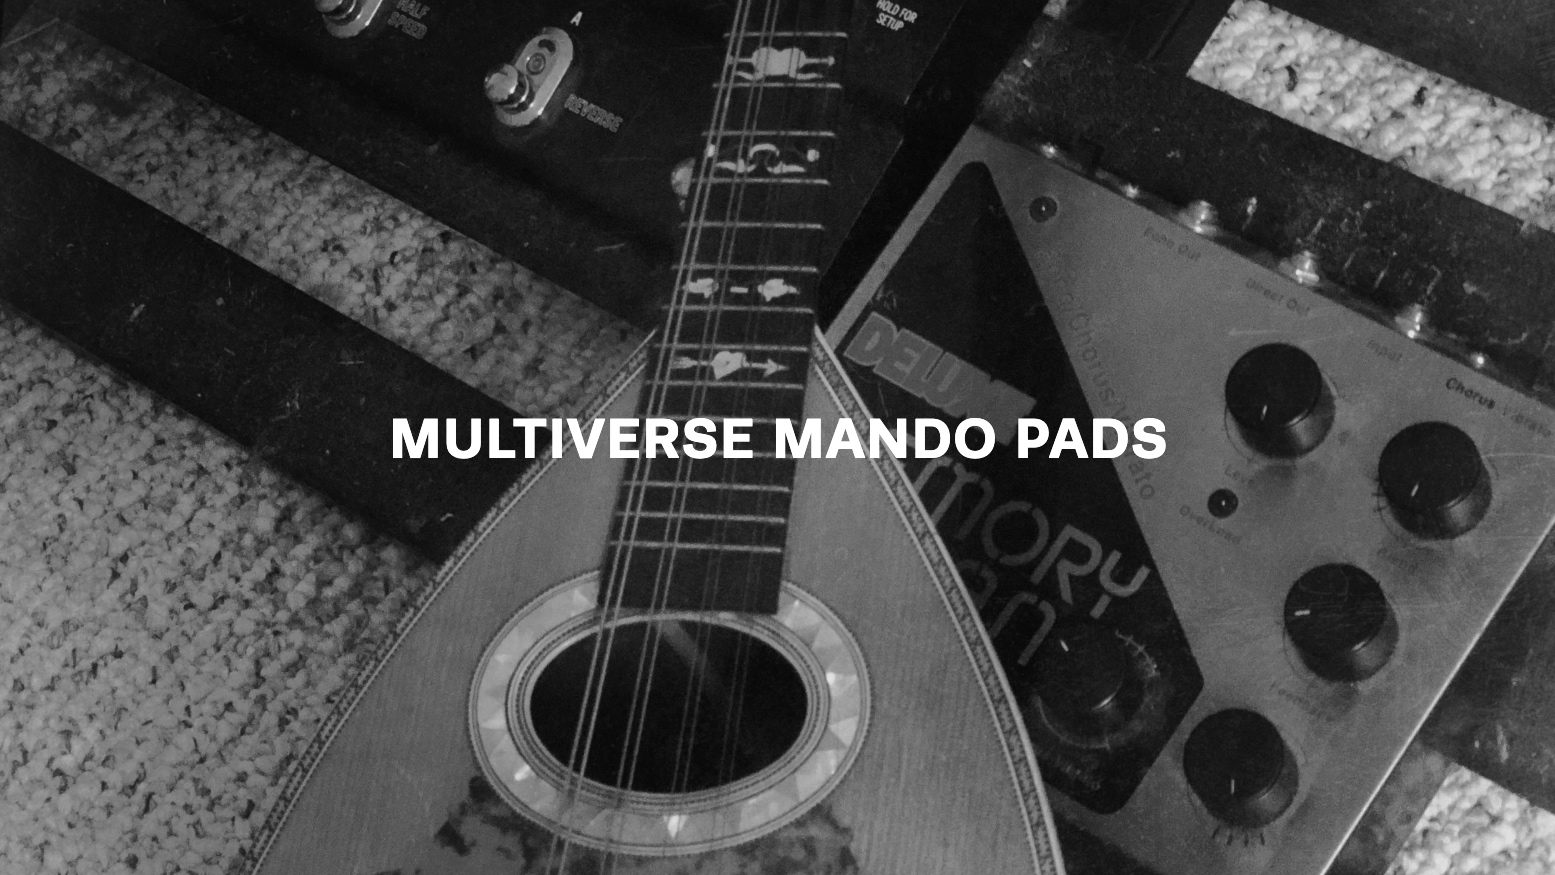 Multiverse Mando Pad Text.jpg